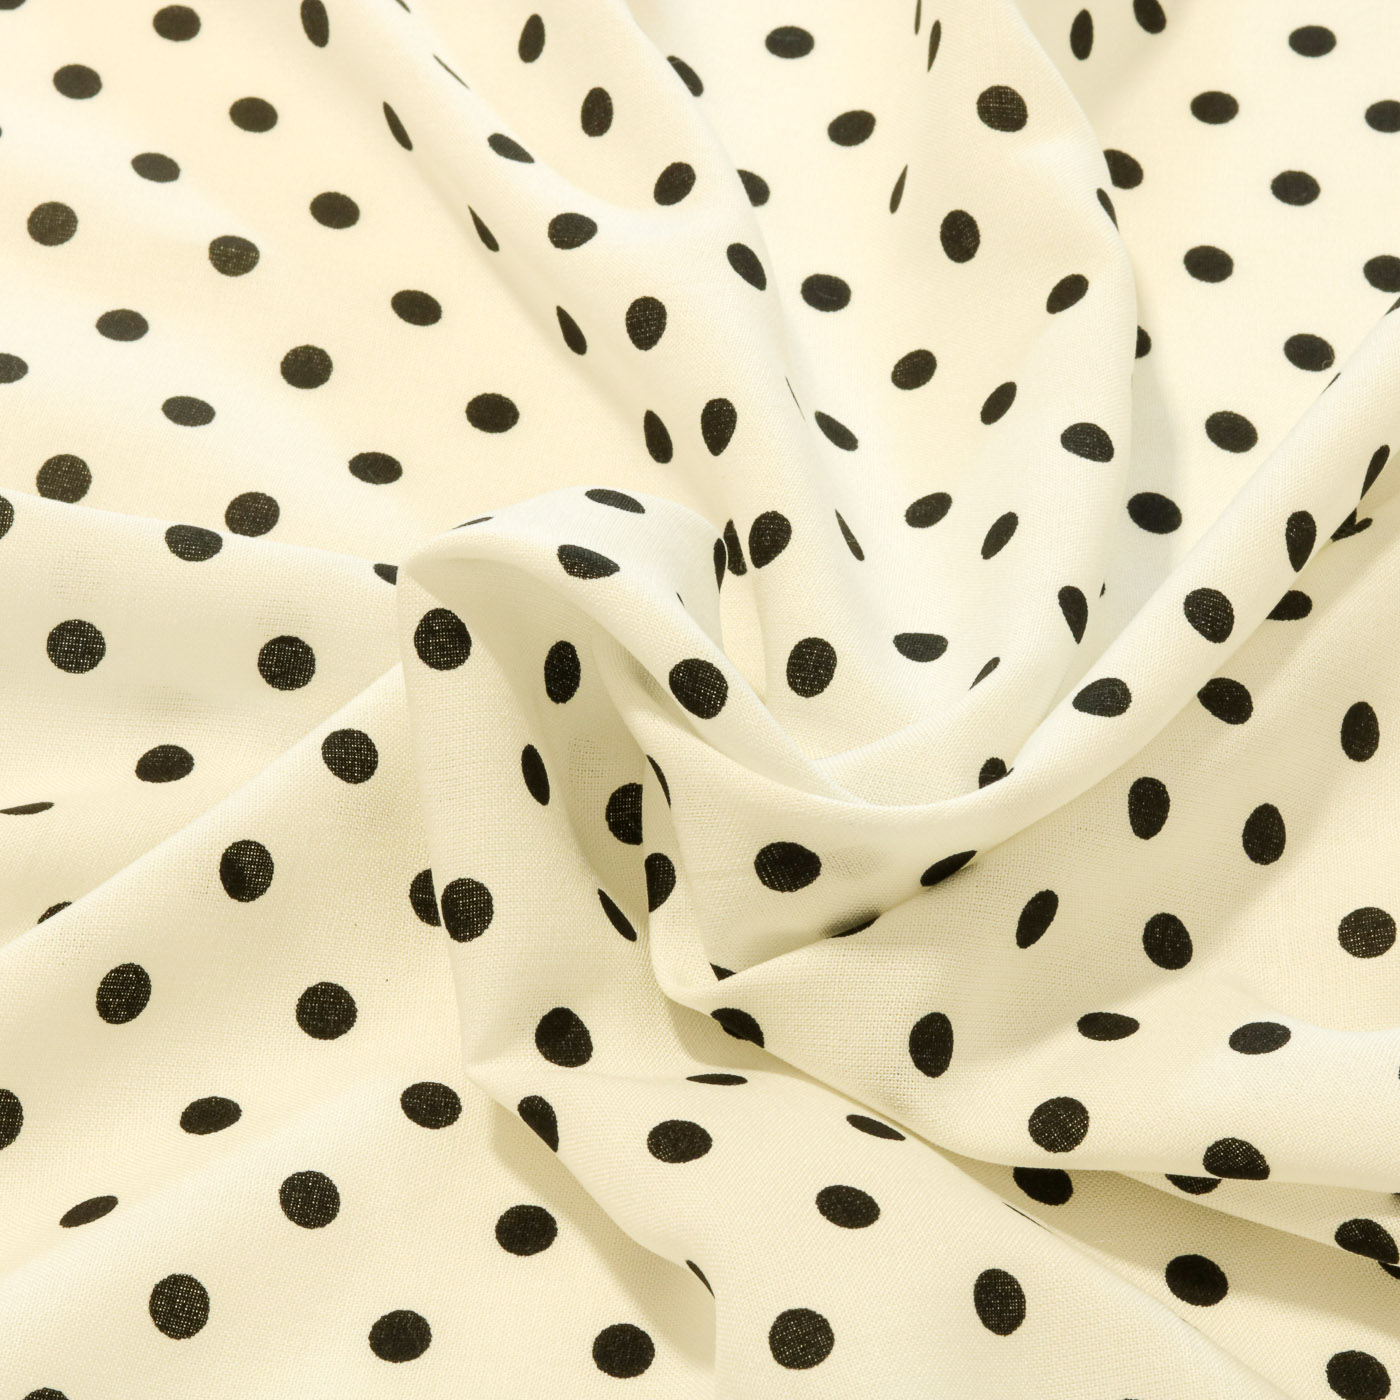 Tecido Viscose Estampada Poa Bolas Preta 100% Viscose Branco